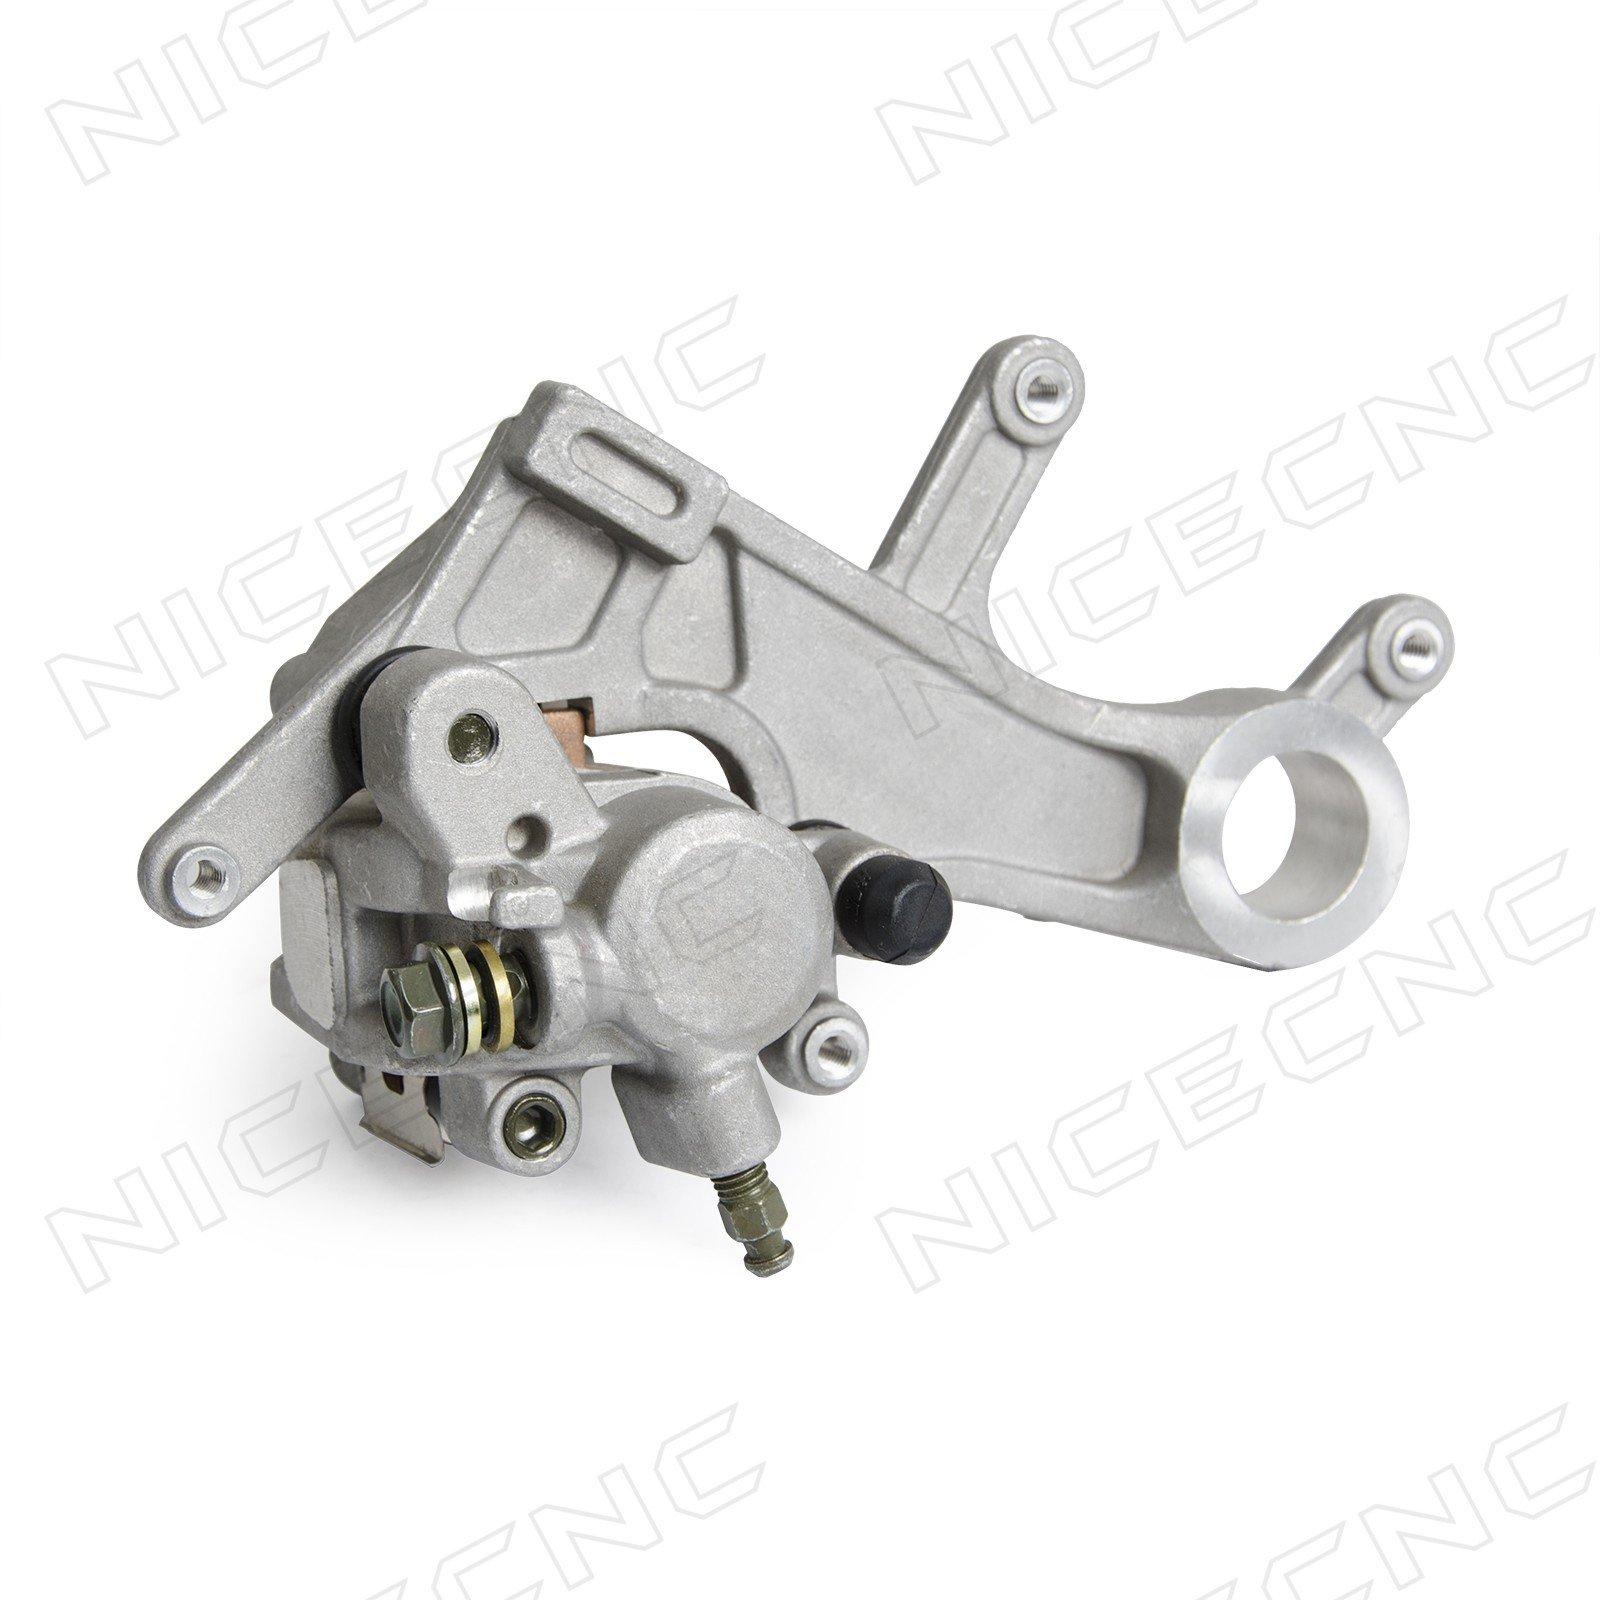 NICECNC Rear Brake Caliper Assembly for CRF450R A 2002-2007 CRF450X A/AC 2005-2006 CRF250R/450R 2A CRF450R 2A/A 2008 CRF450R/450X AC 2012-2016